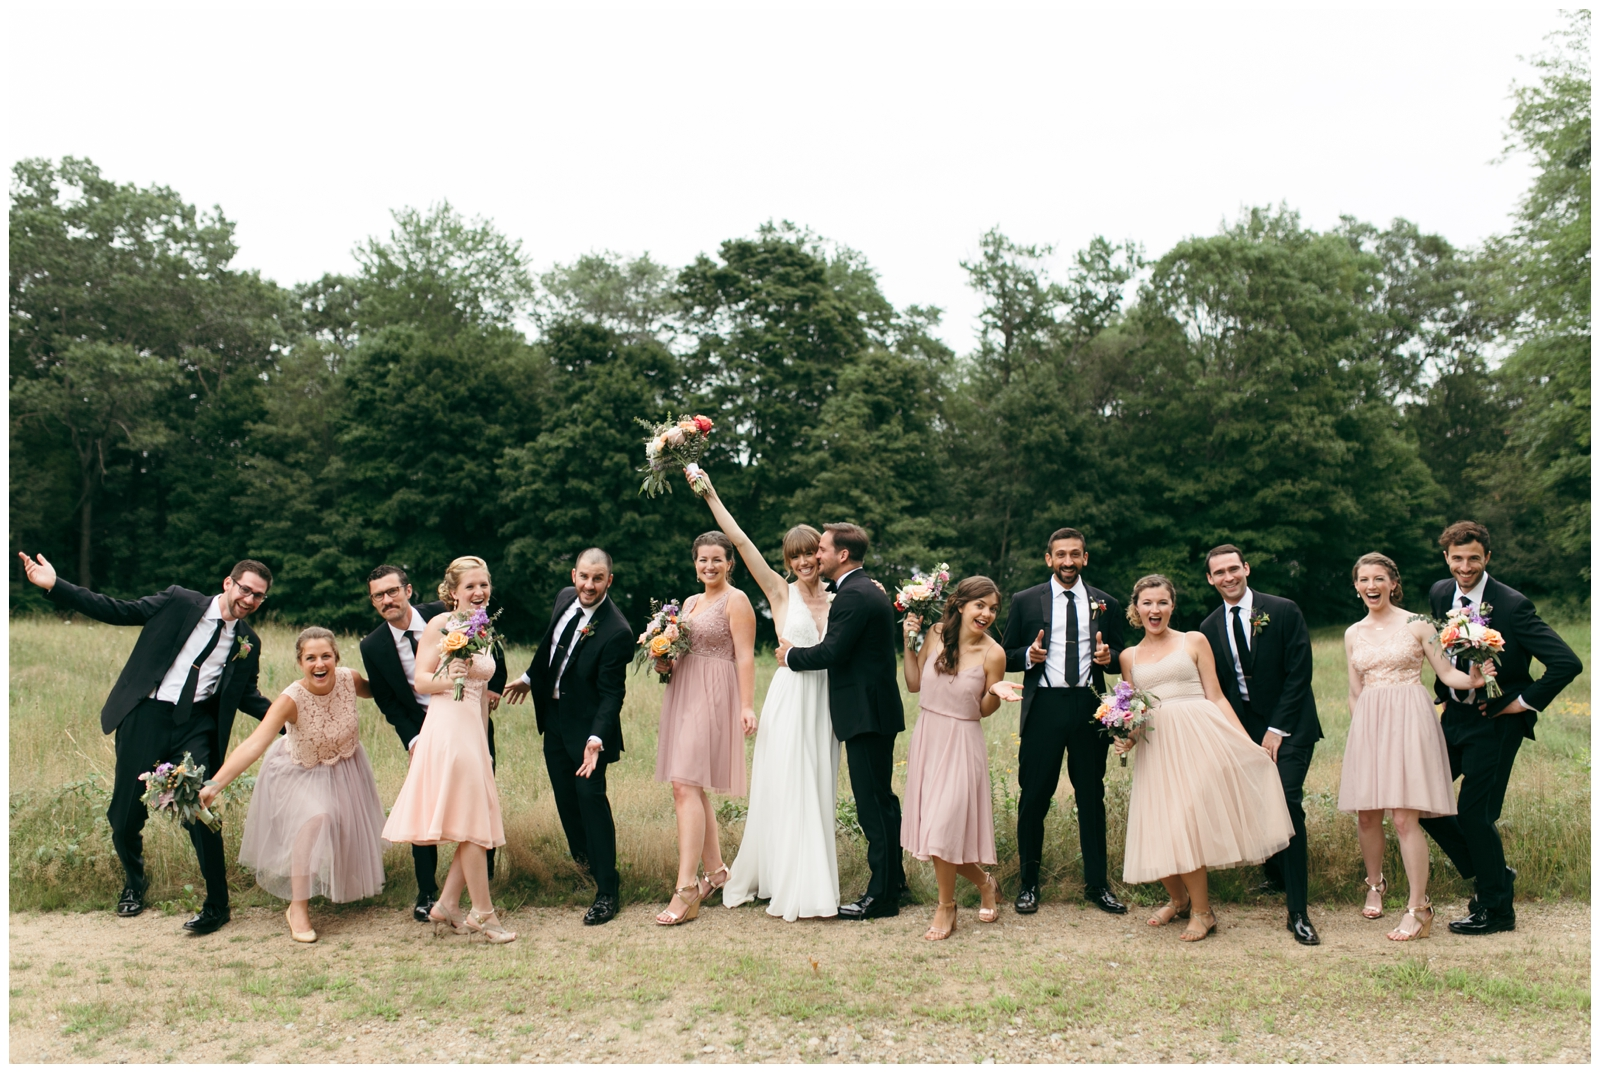 Moraine-Farm-wedding-Bailey-Q-Photo-Massachusetts-wedding-photpgrapher-035.jpg